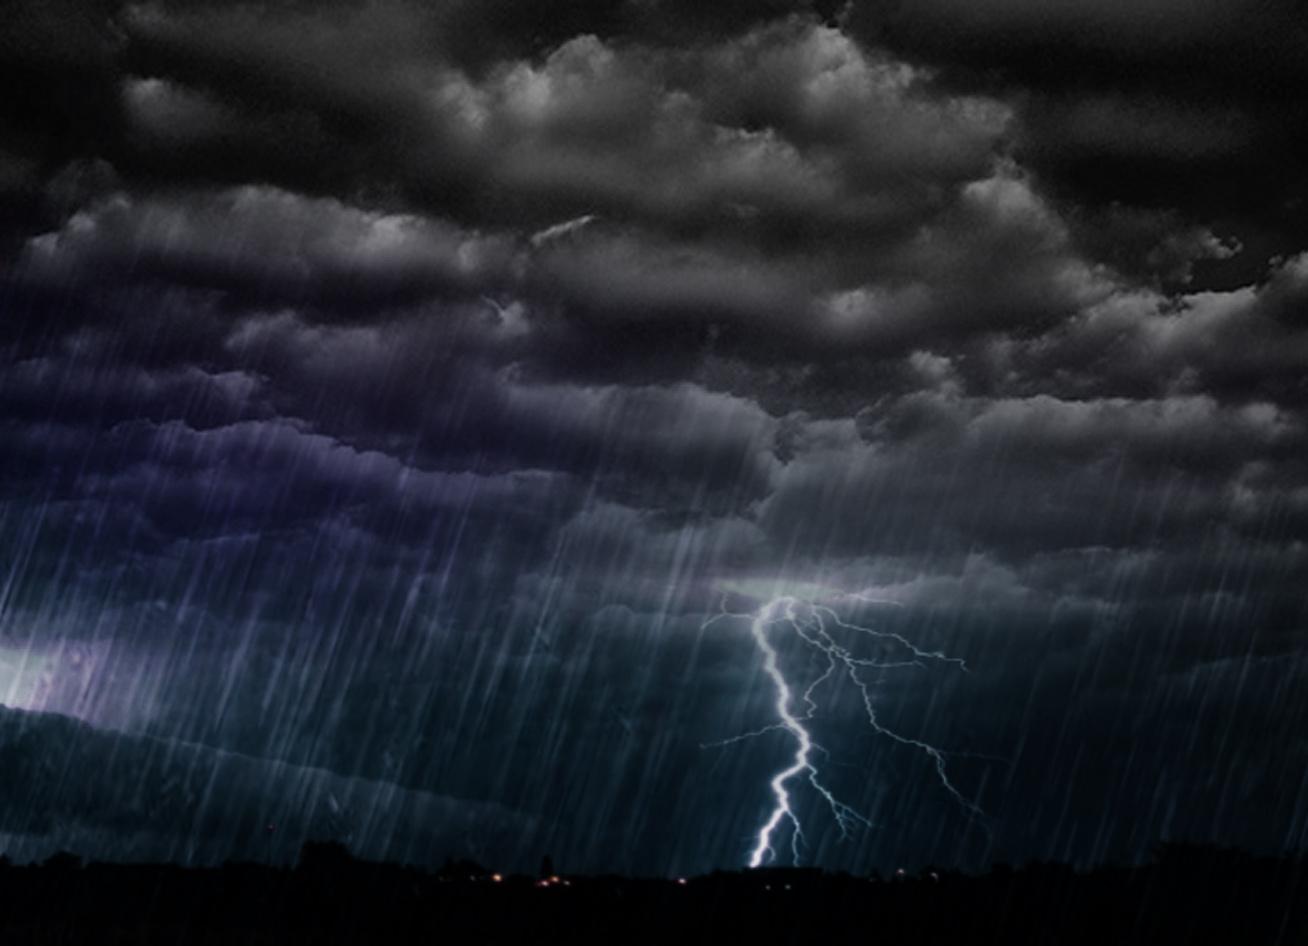 Cod galben de furtuna azi la Satu Mare. Se asteapta pana la 80 litri de apa pe metru patrat